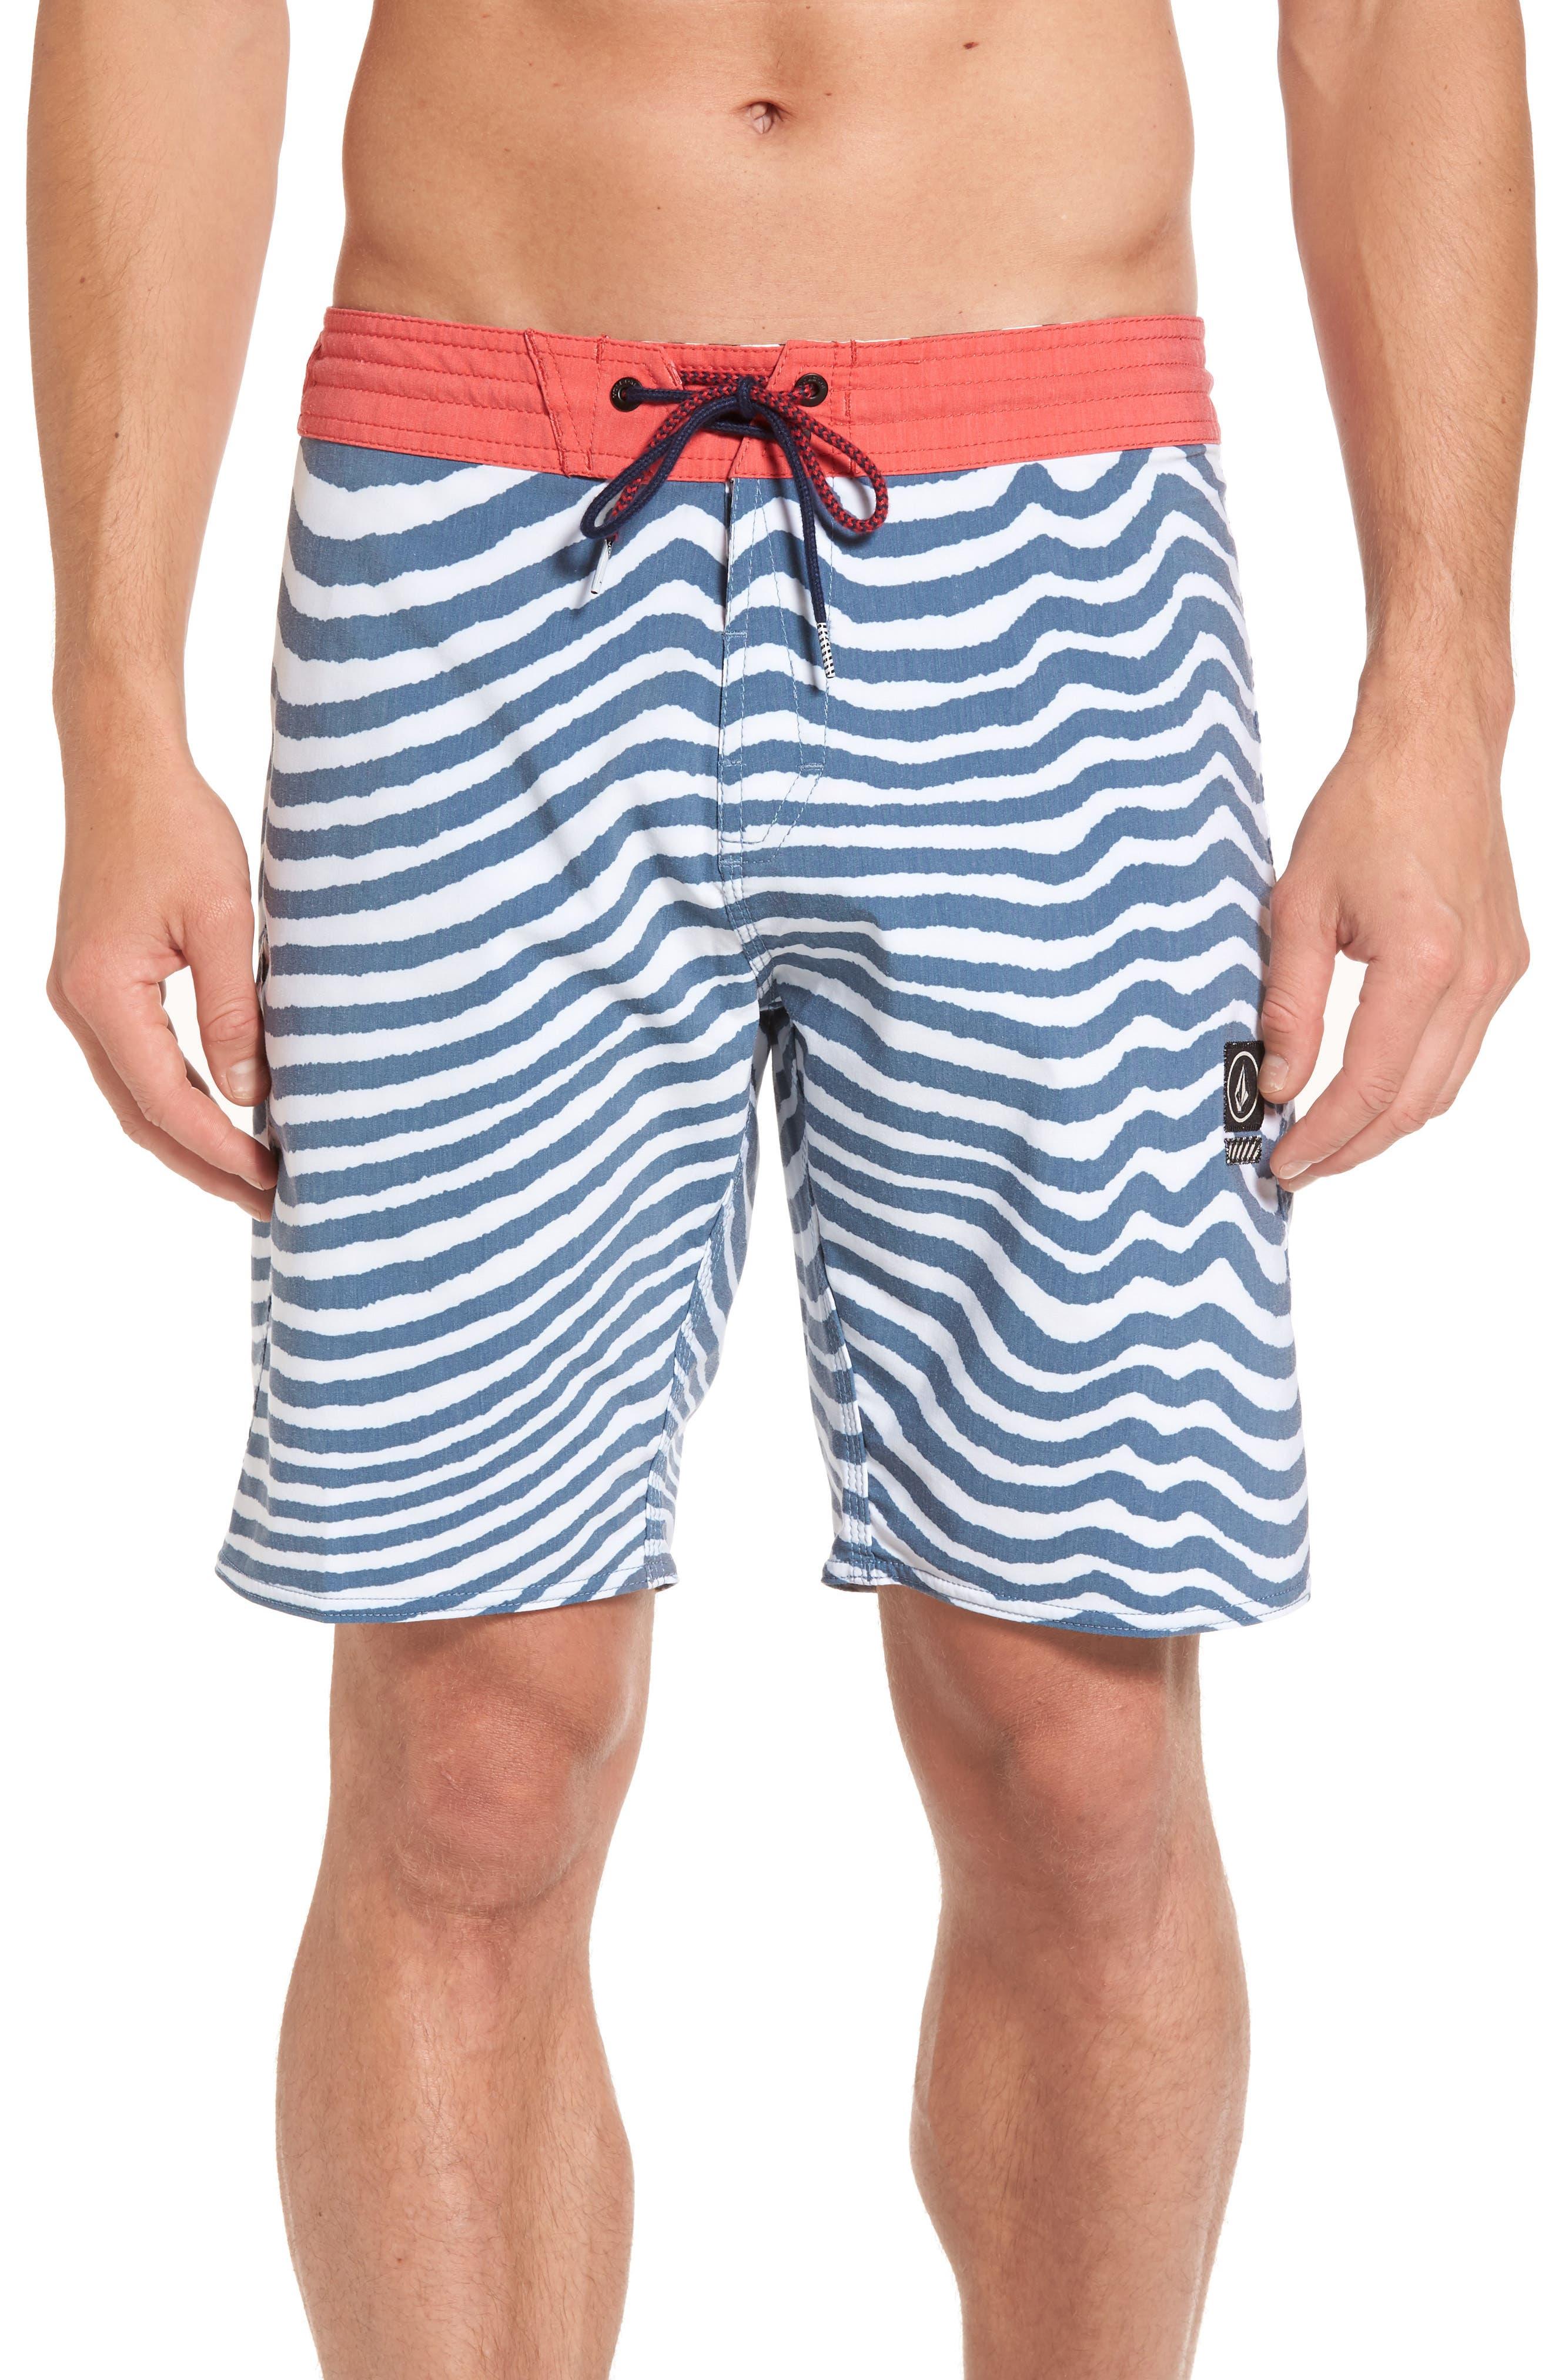 Stripey Slinger Board Shorts,                             Main thumbnail 4, color,